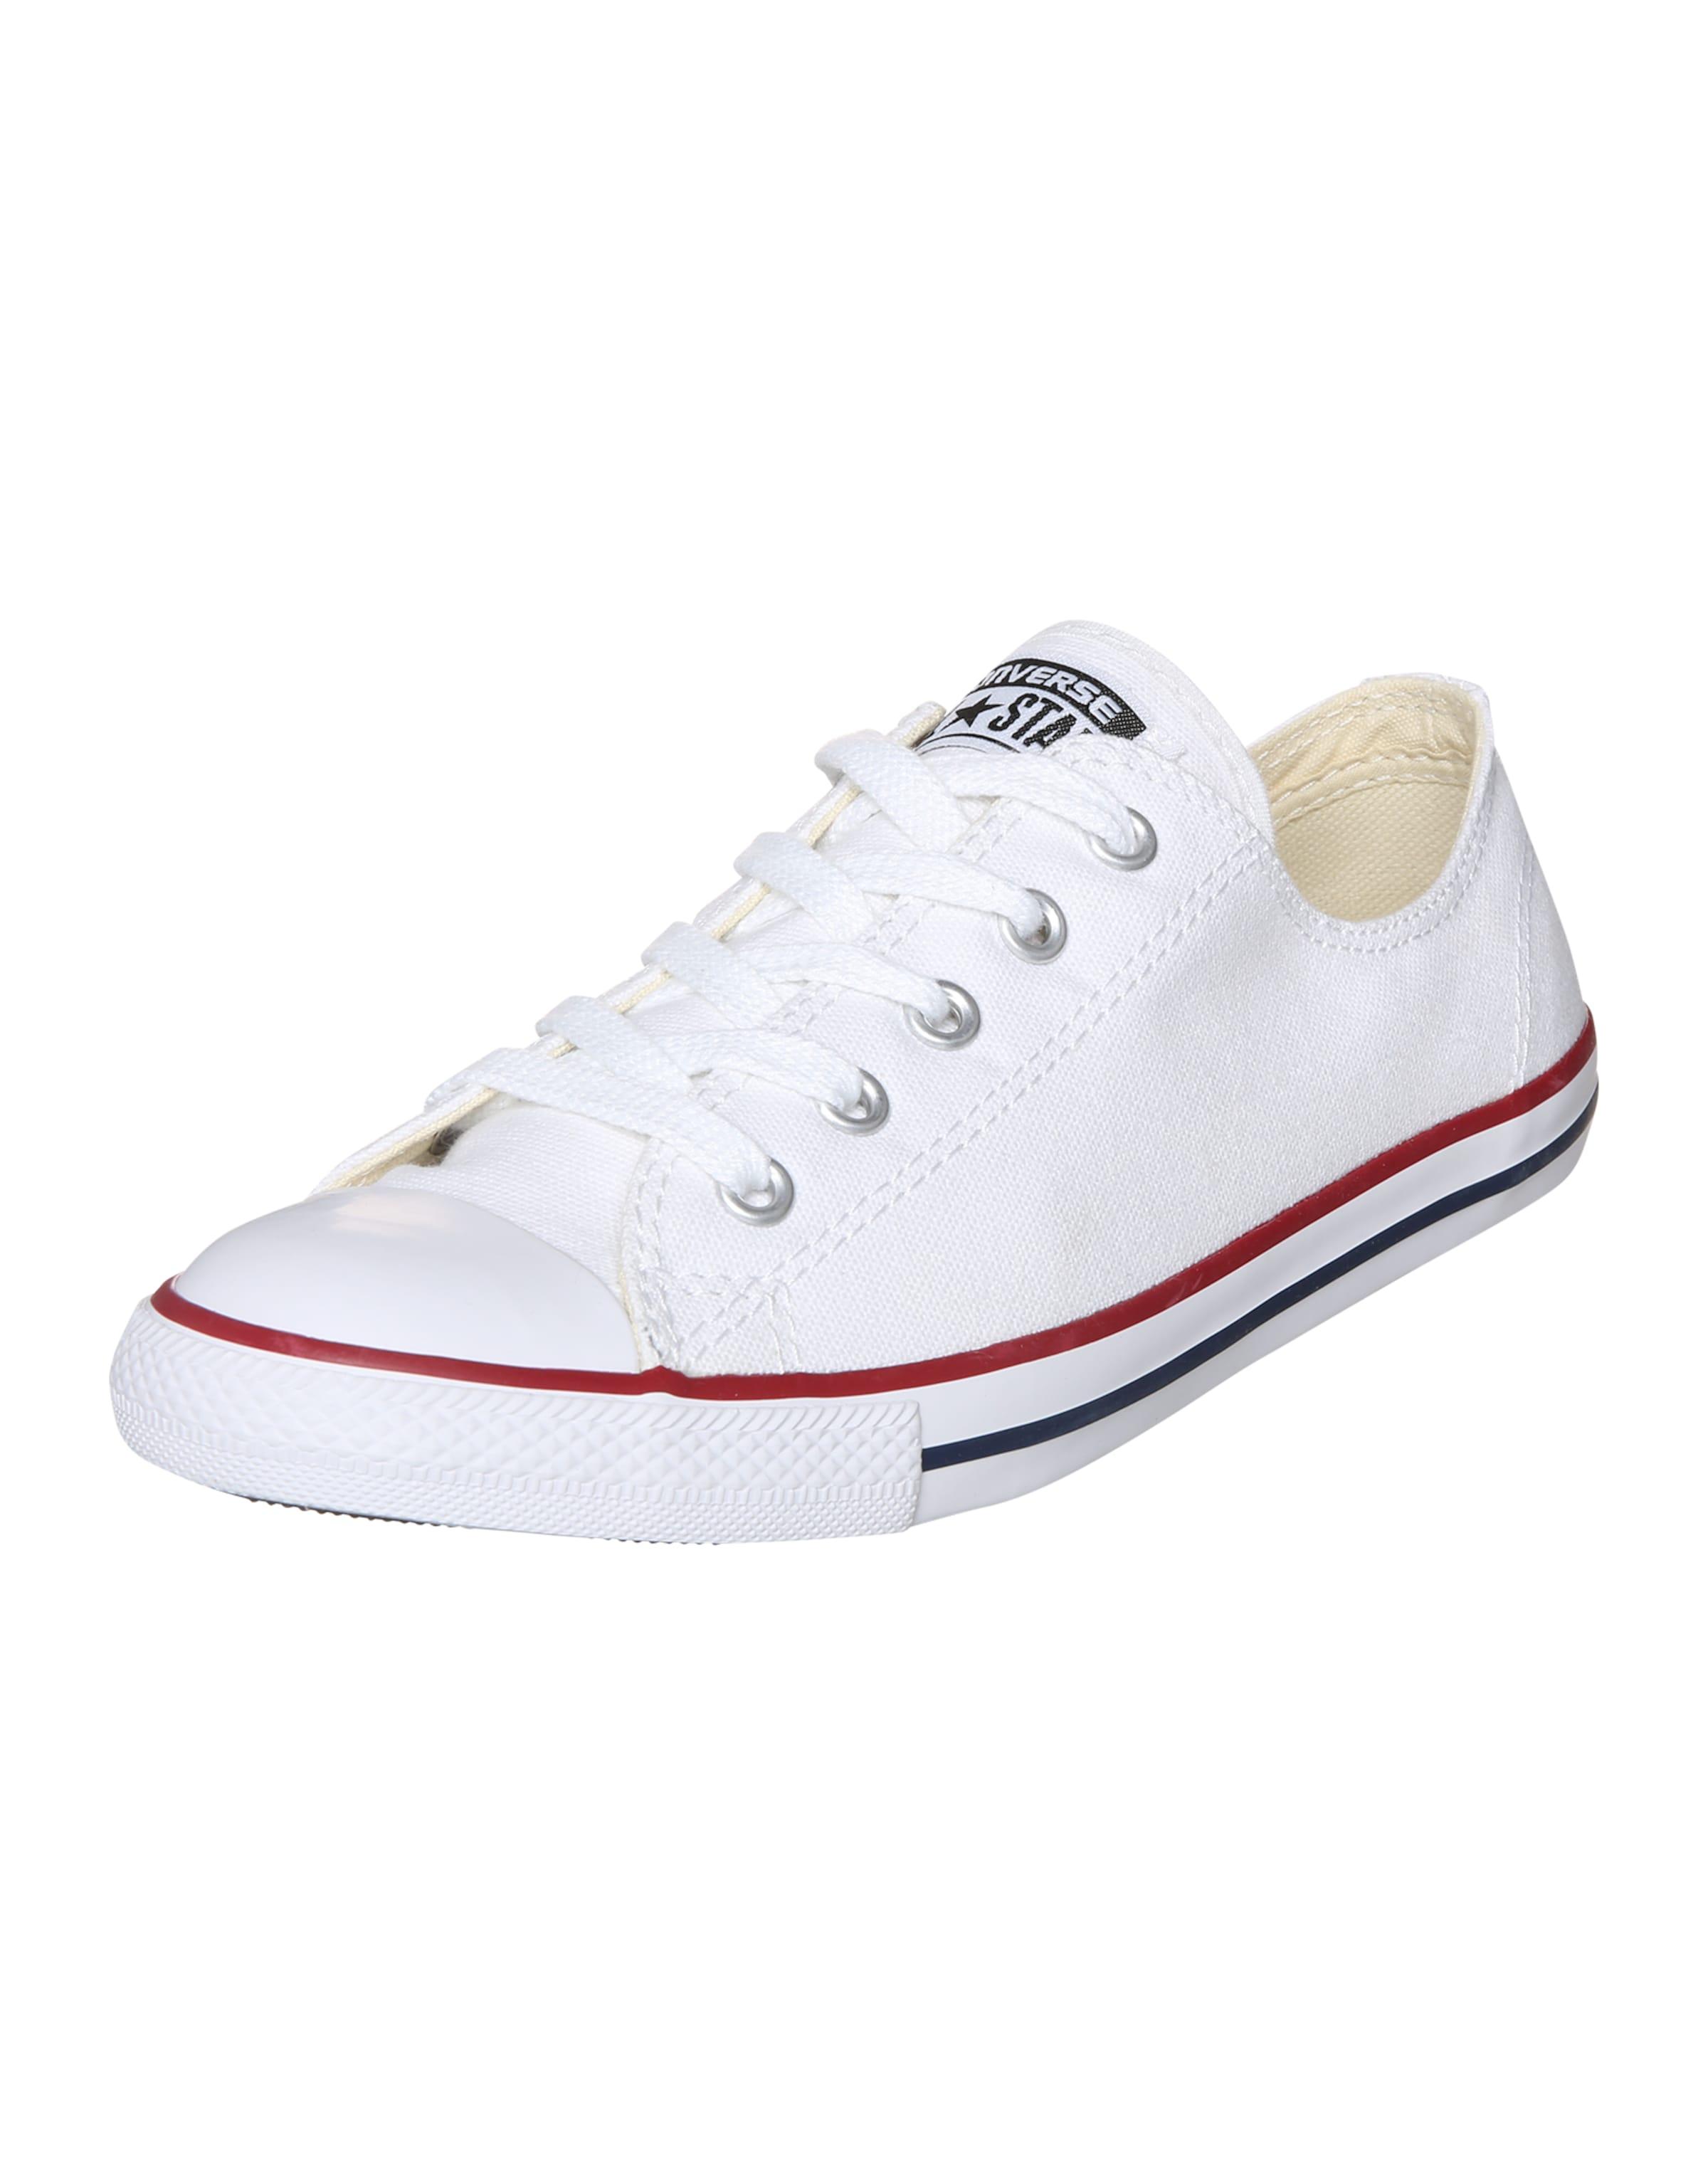 UltramarinblauRot Converse Sneaker 'ctas Dainty' Schwarz Weiß In RLq354Aj